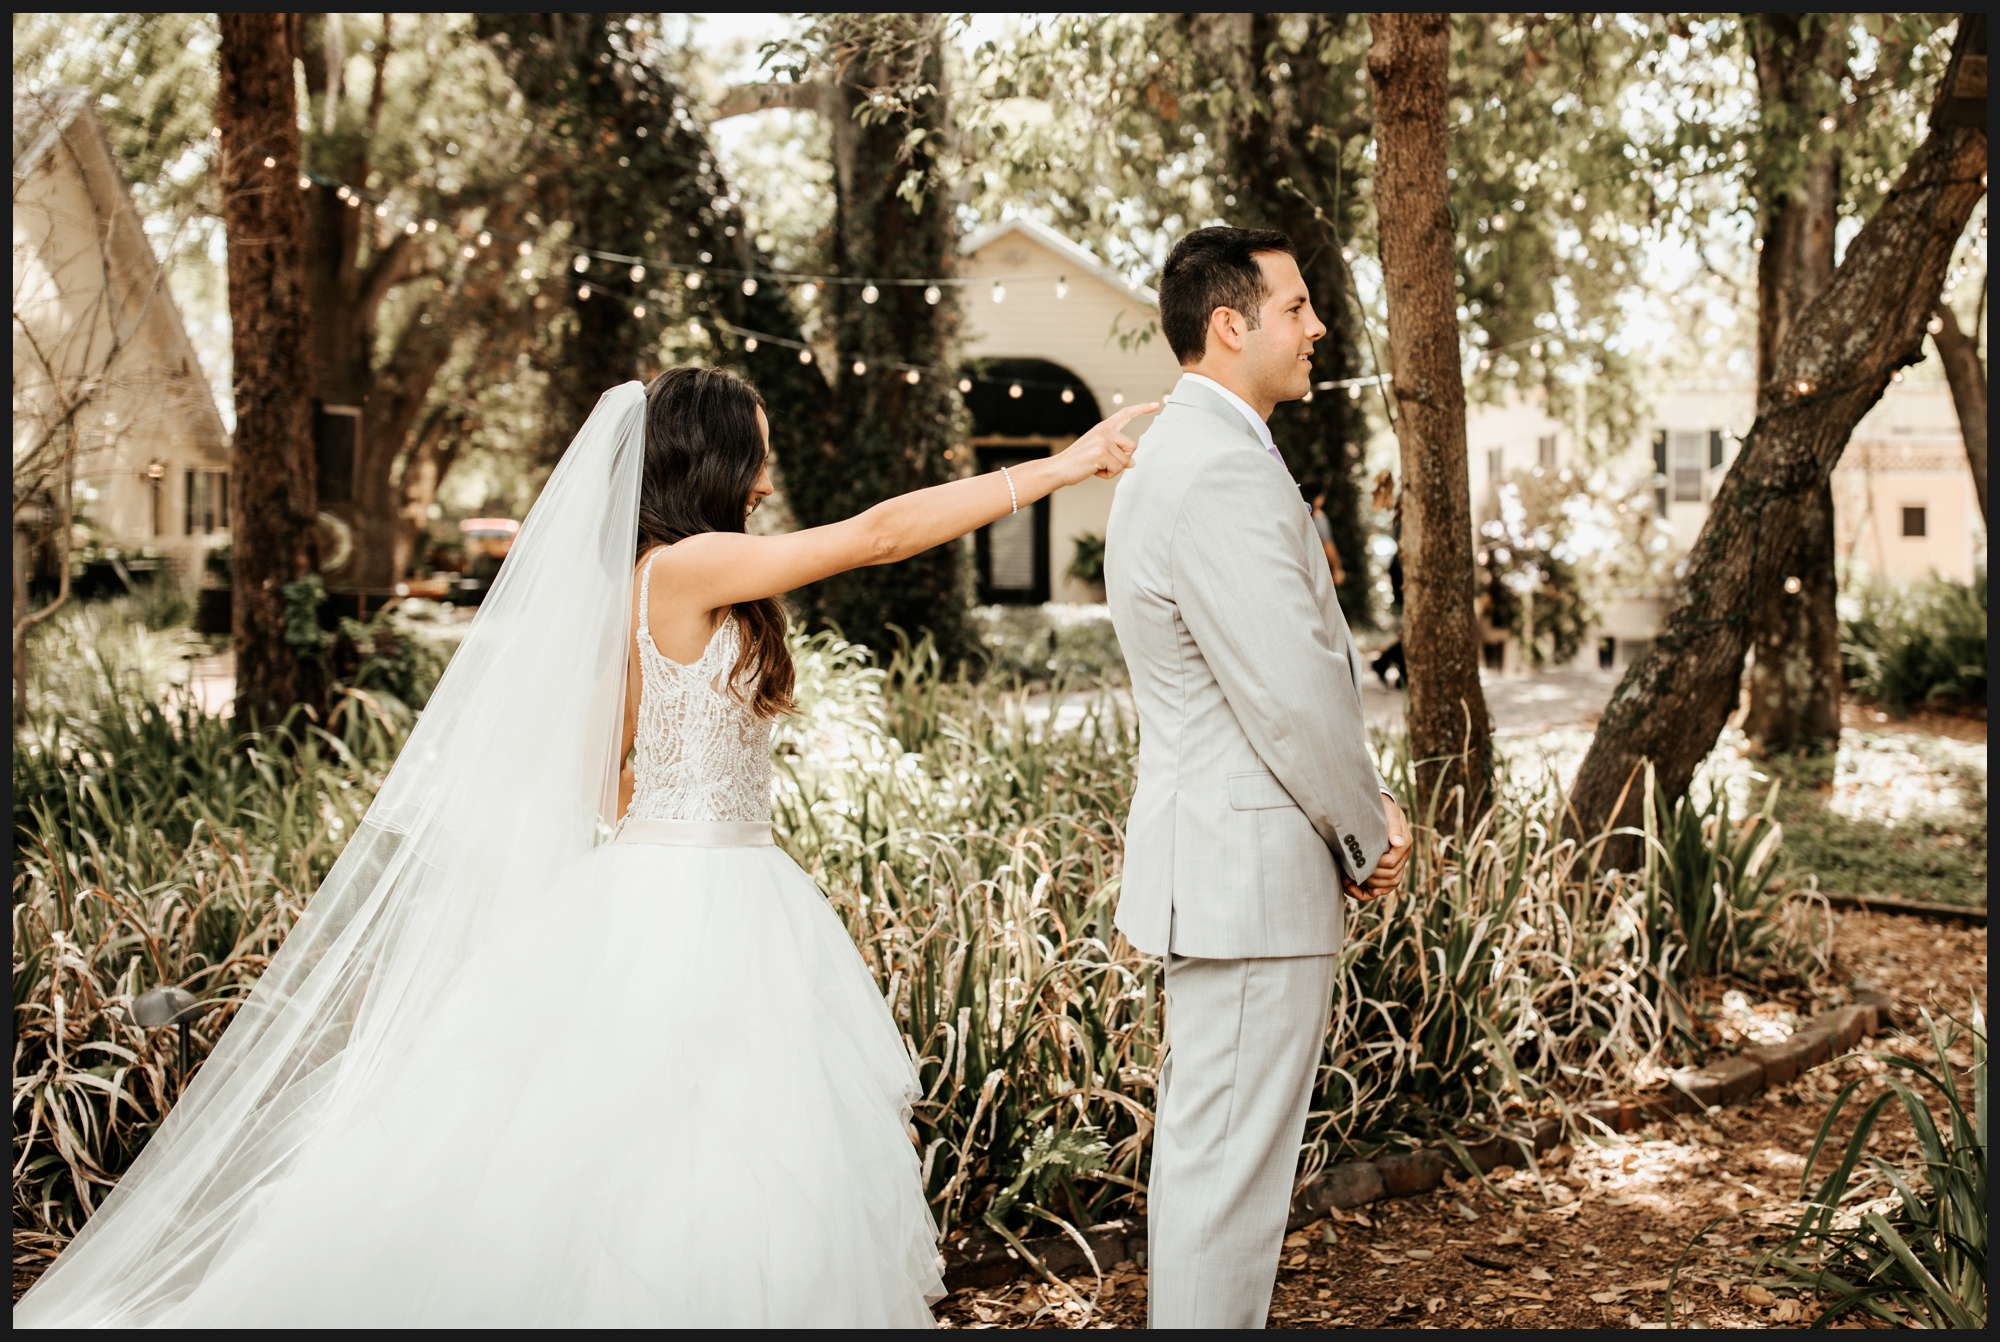 Orlando-Wedding-Photographer-destination-wedding-photographer-florida-wedding-photographer-bohemian-wedding-photographer_1595.jpg